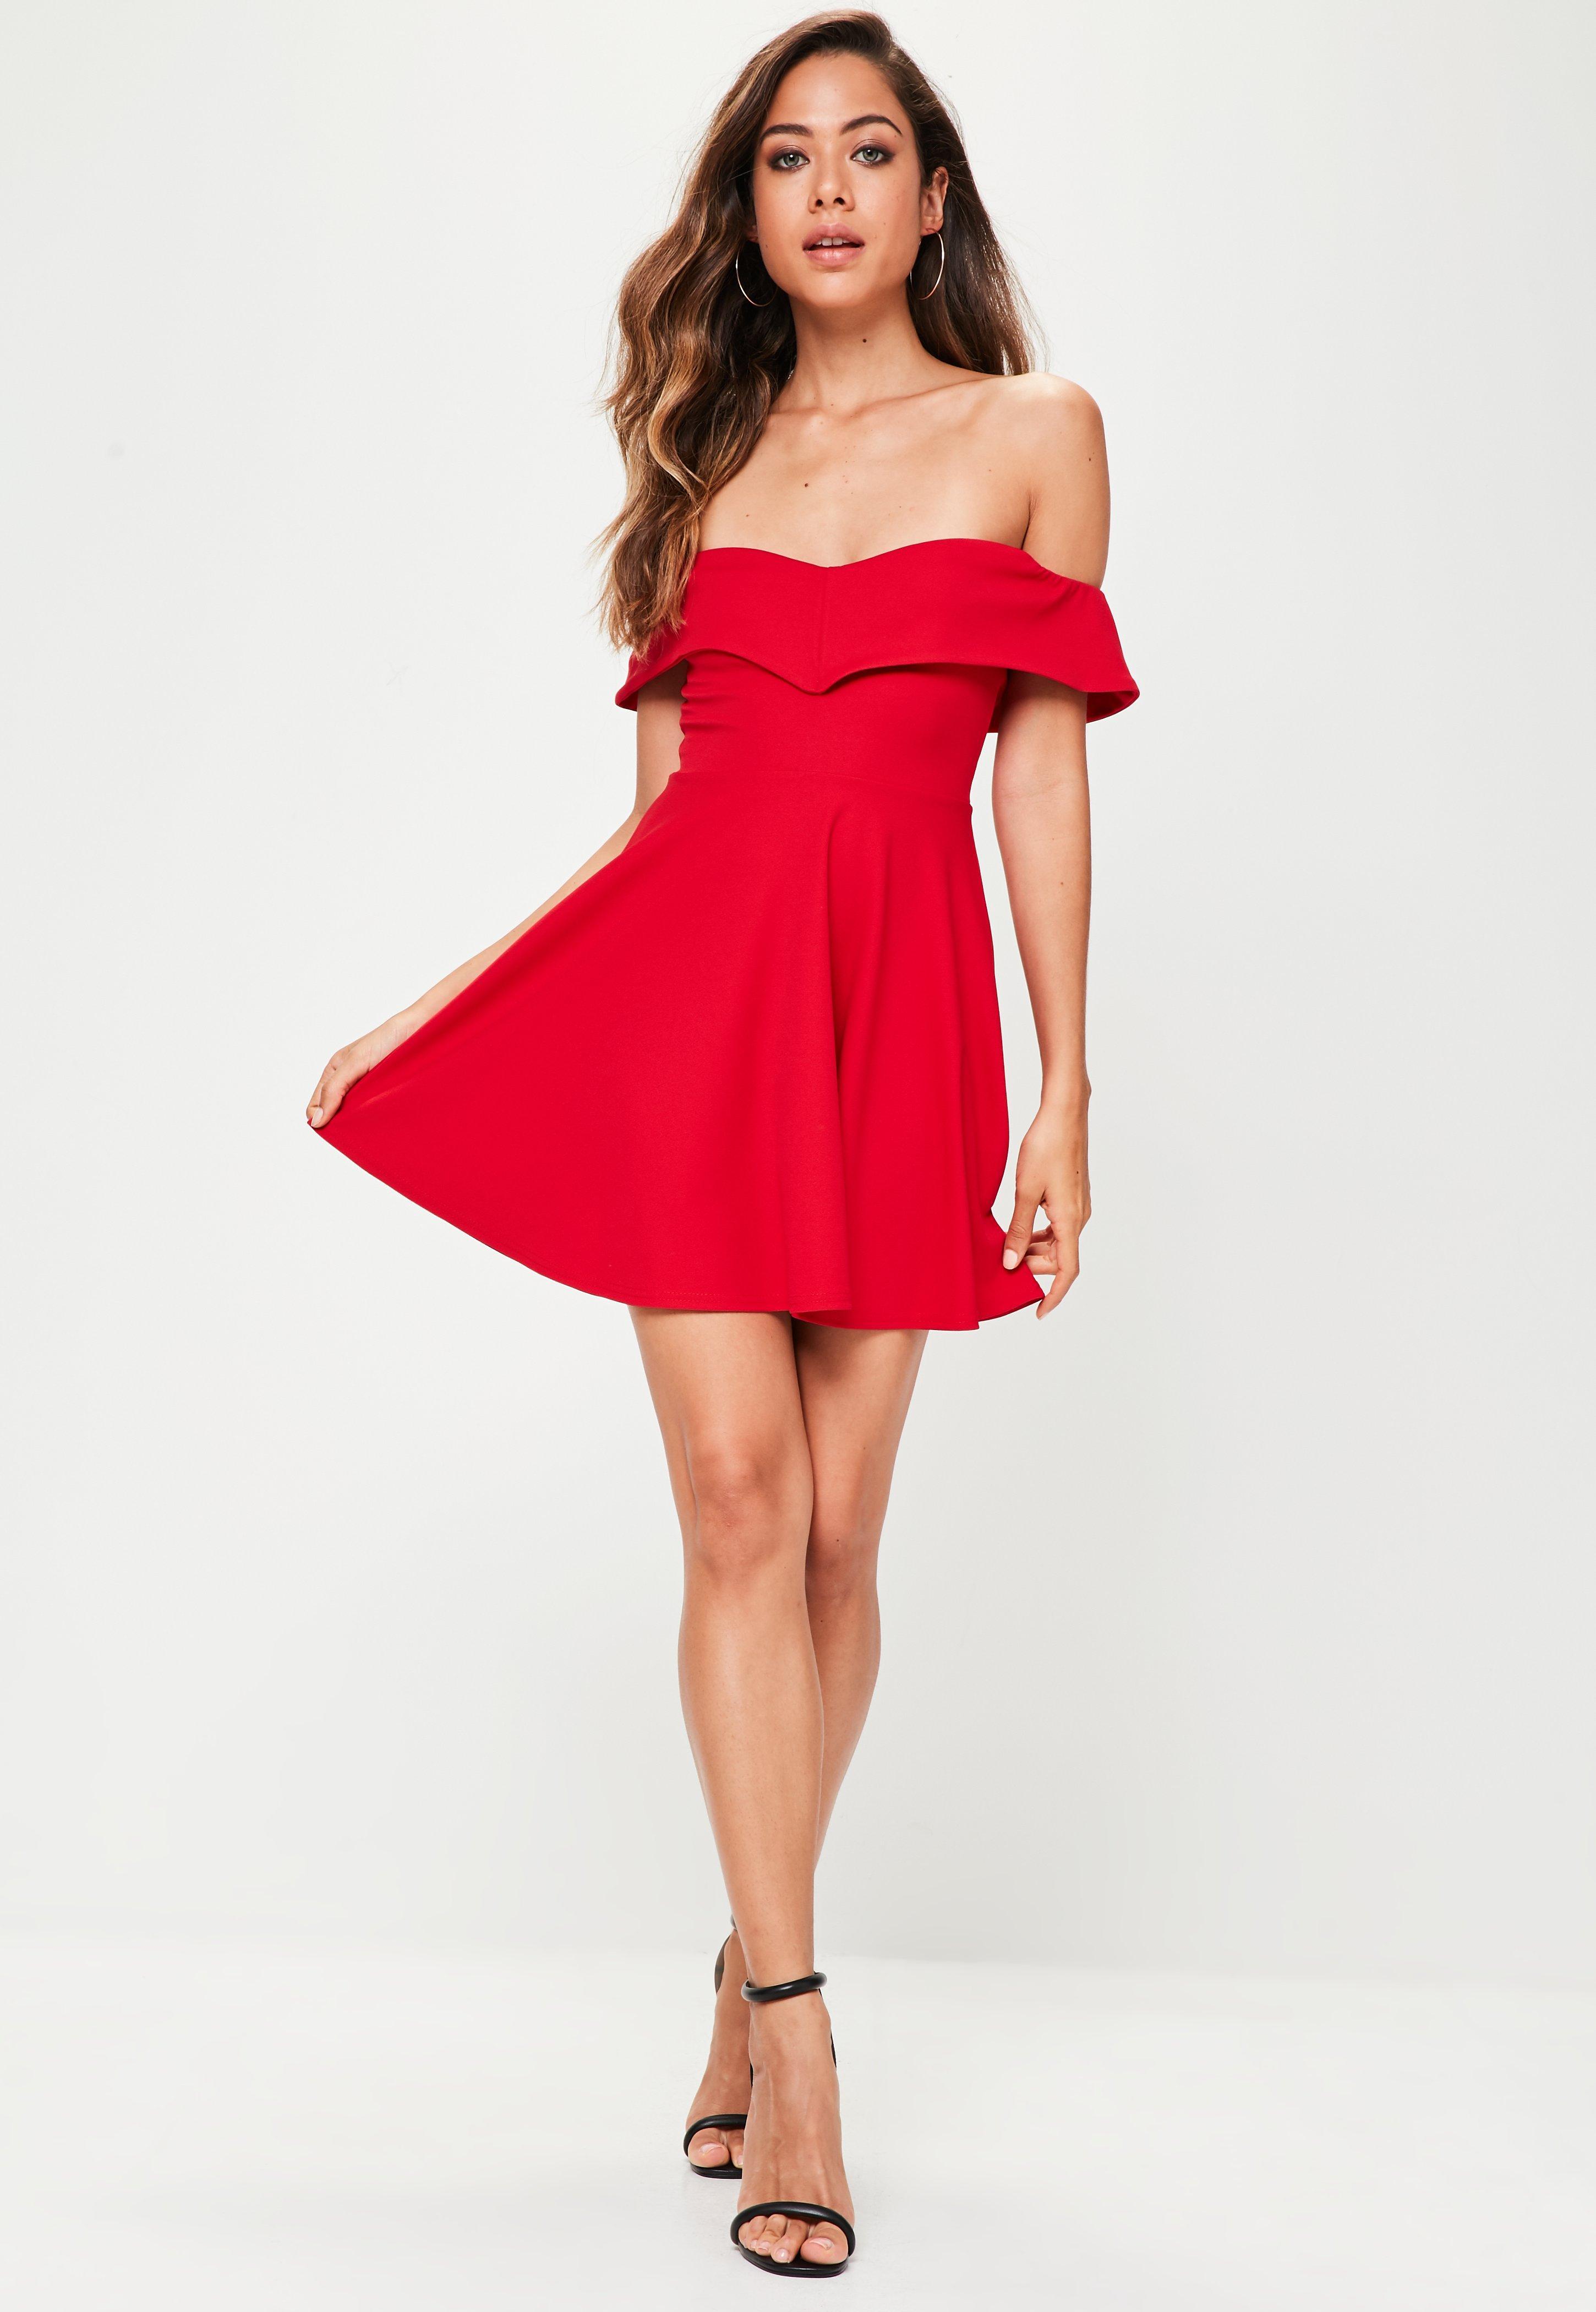 Cocktail Dresses (28)